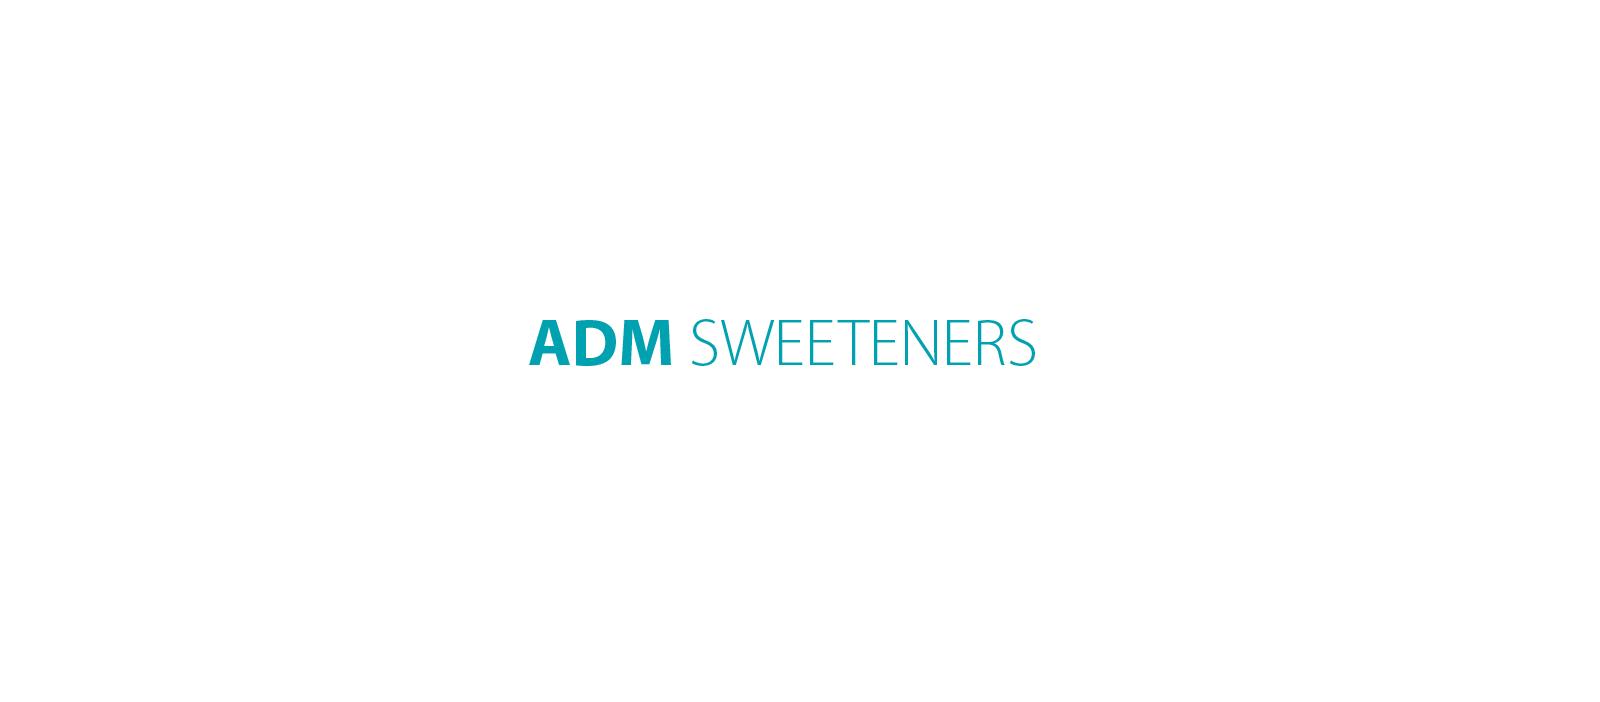 ADM Sweeteners logo